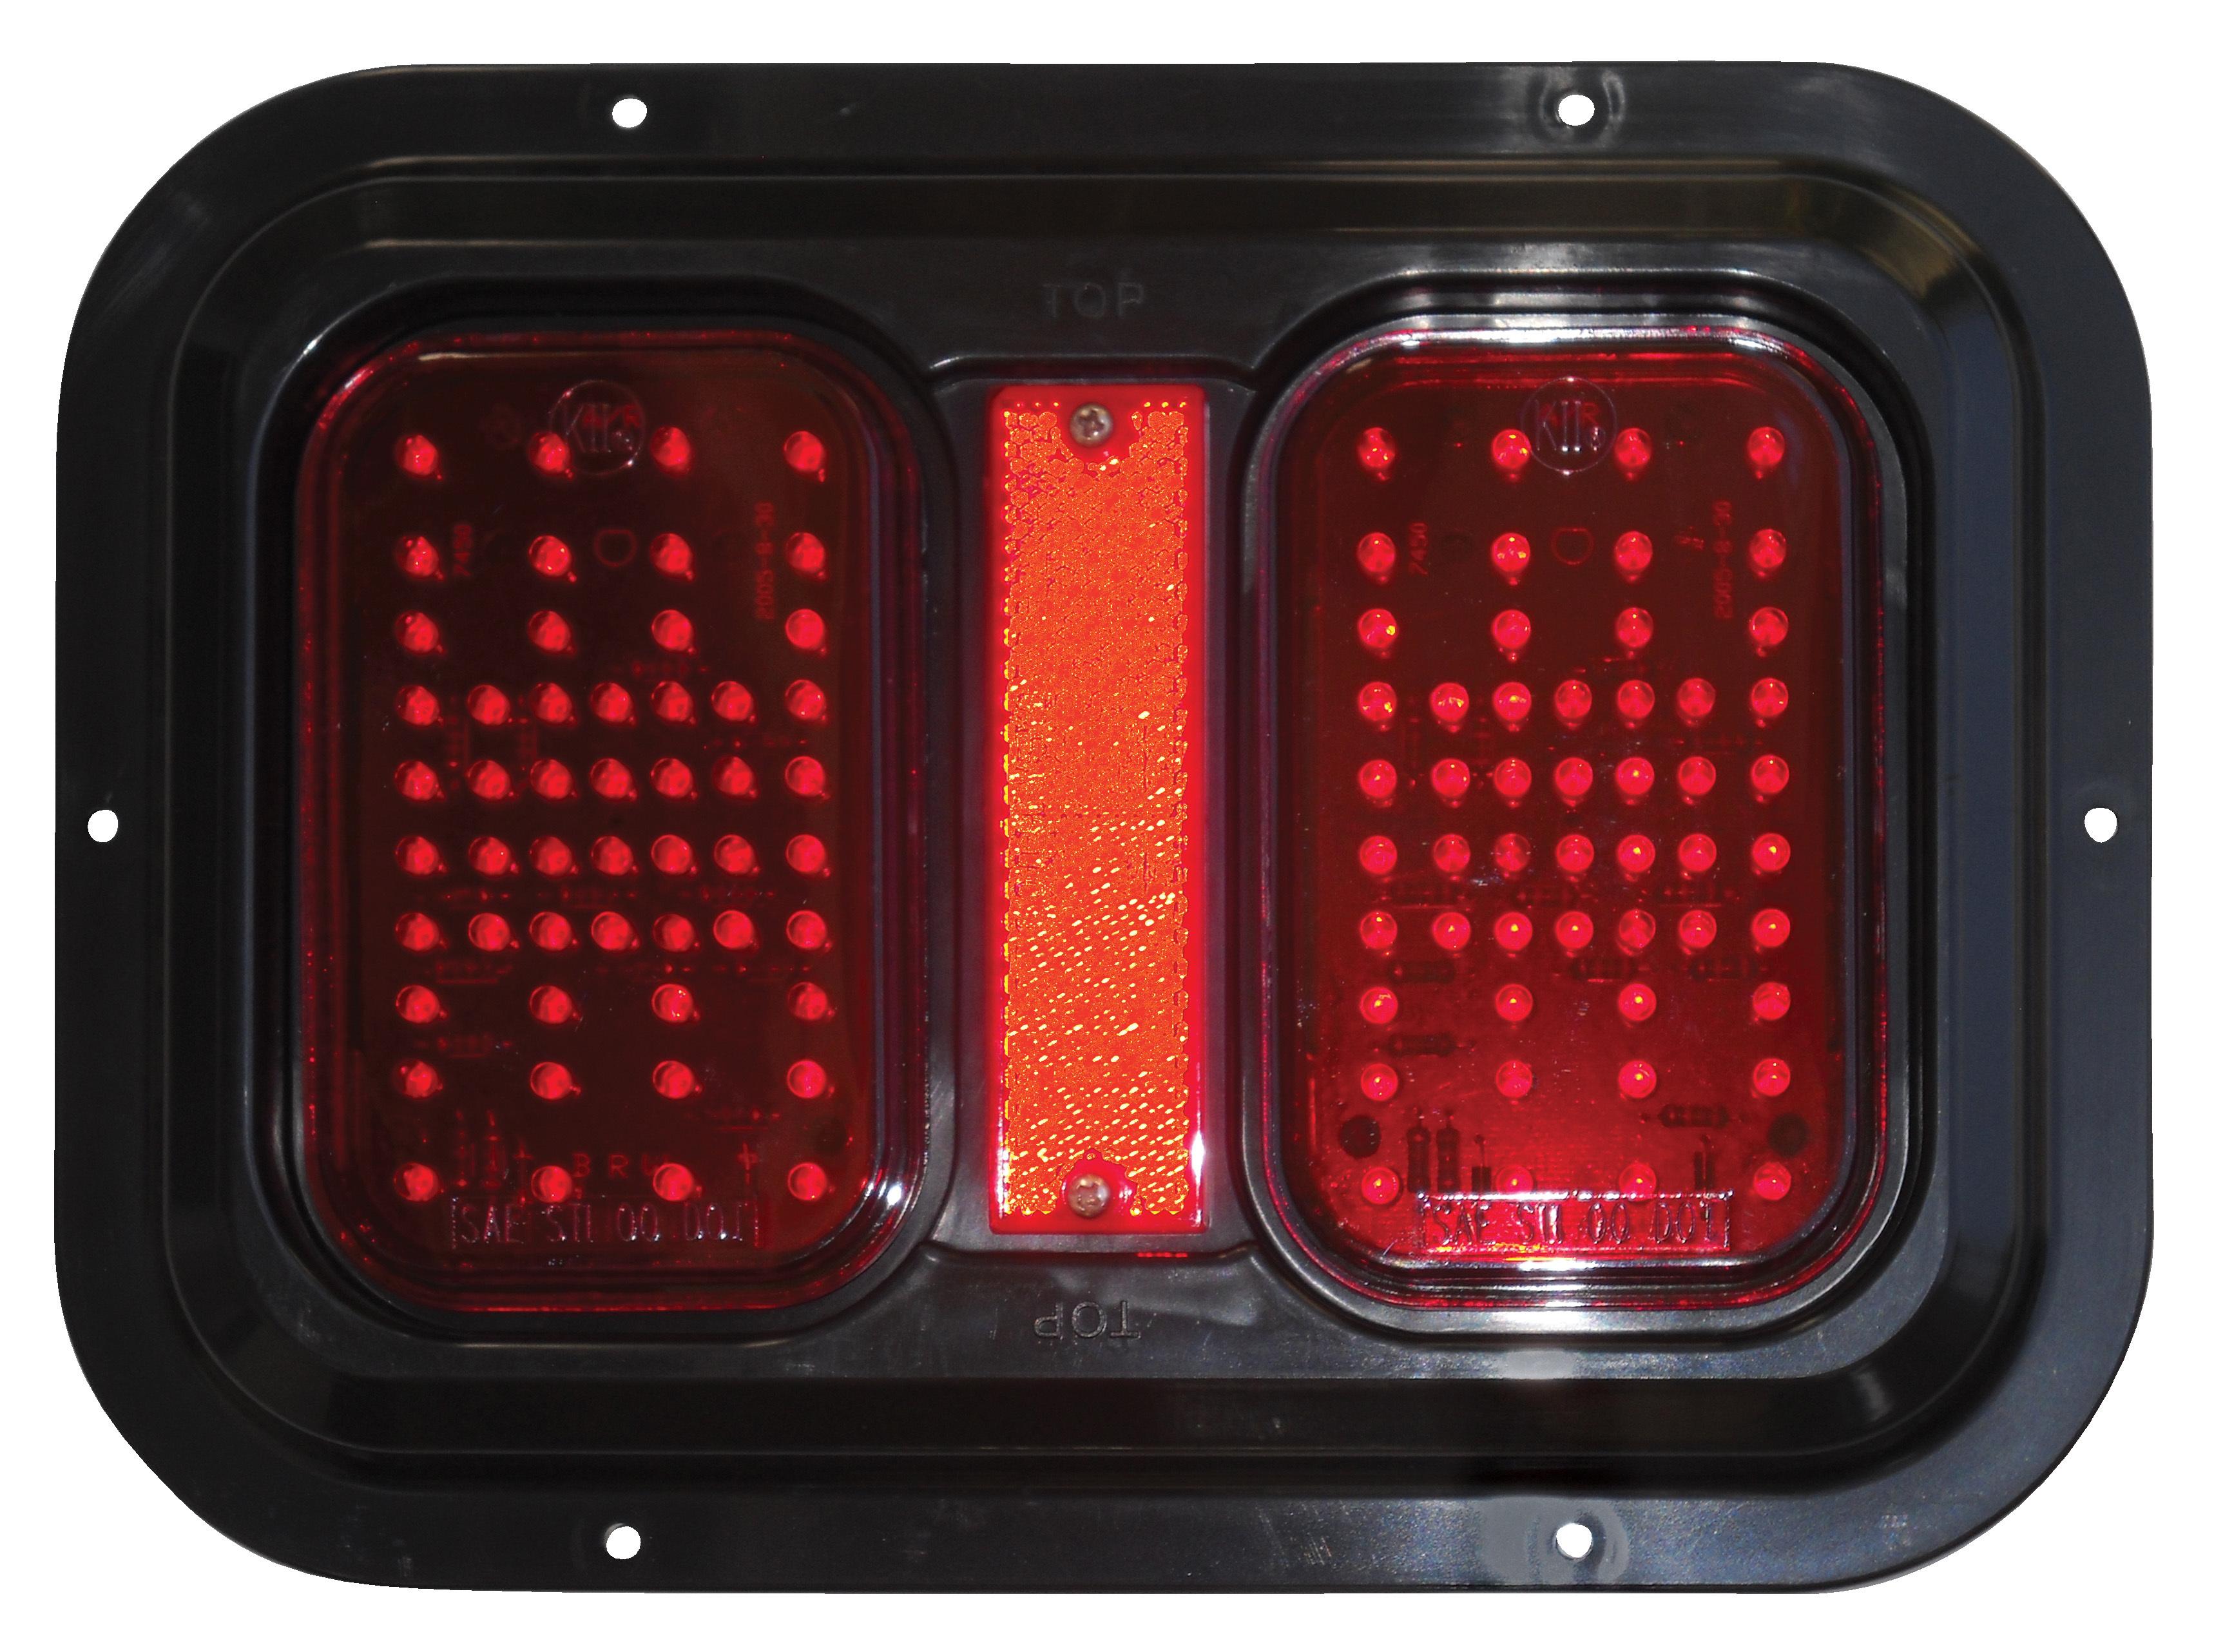 Weatherproof LED Tail Lamp, Turn Signal, and Brake Light 52720